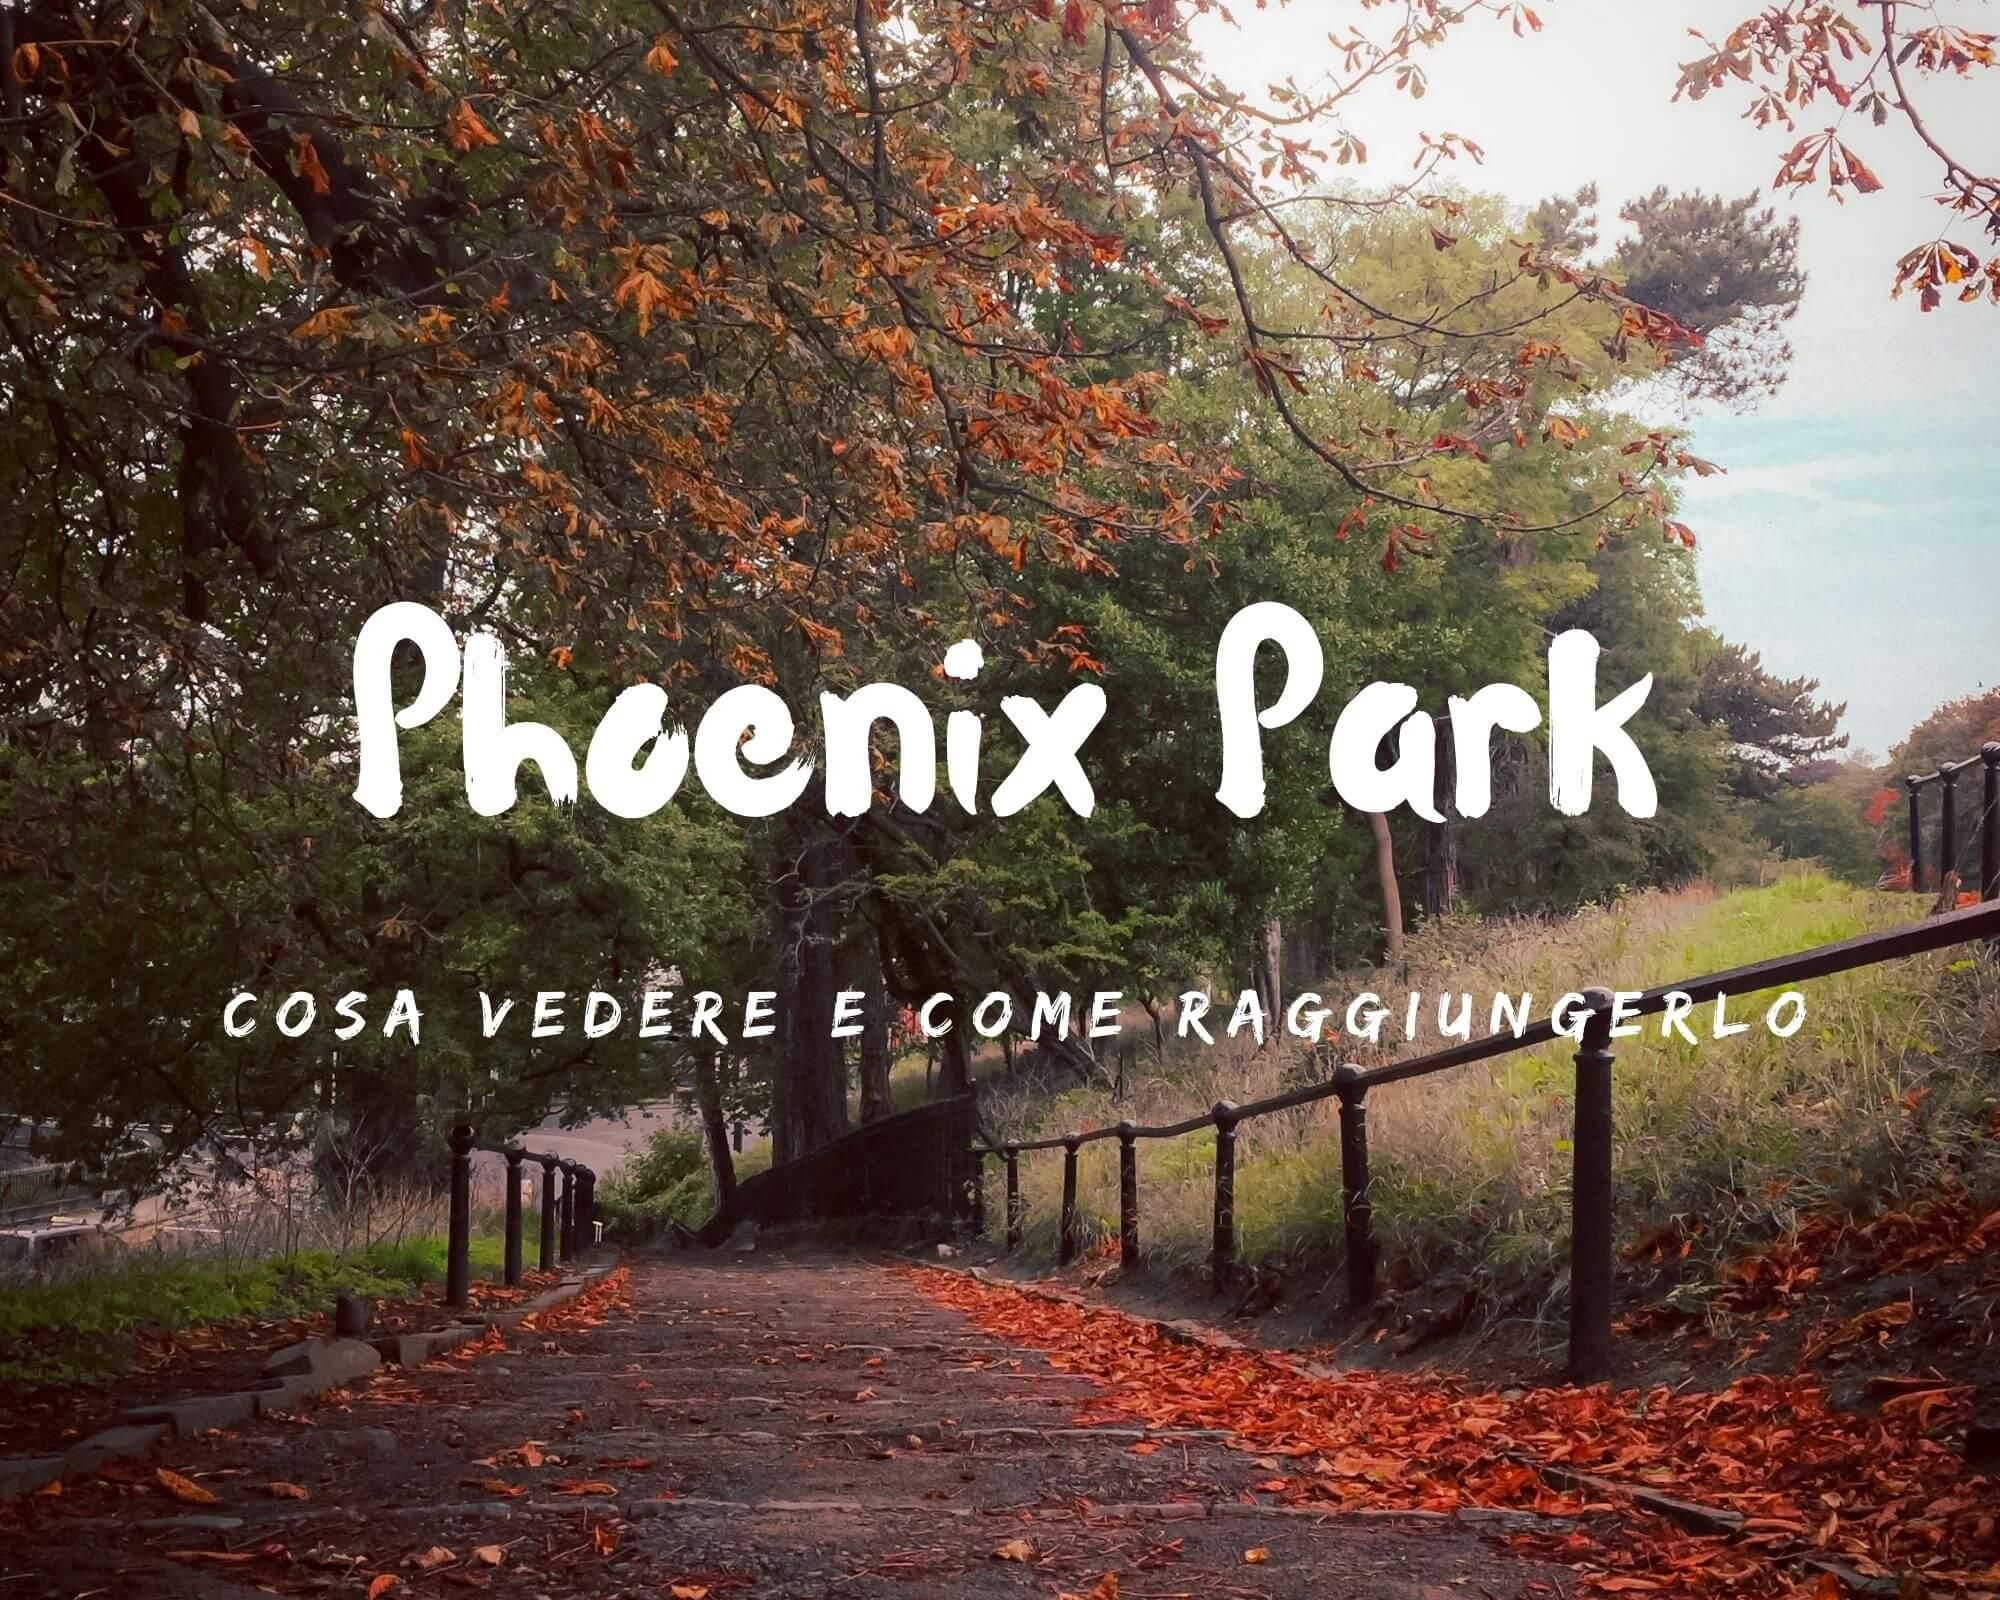 cosa vedere a Phoenix Park